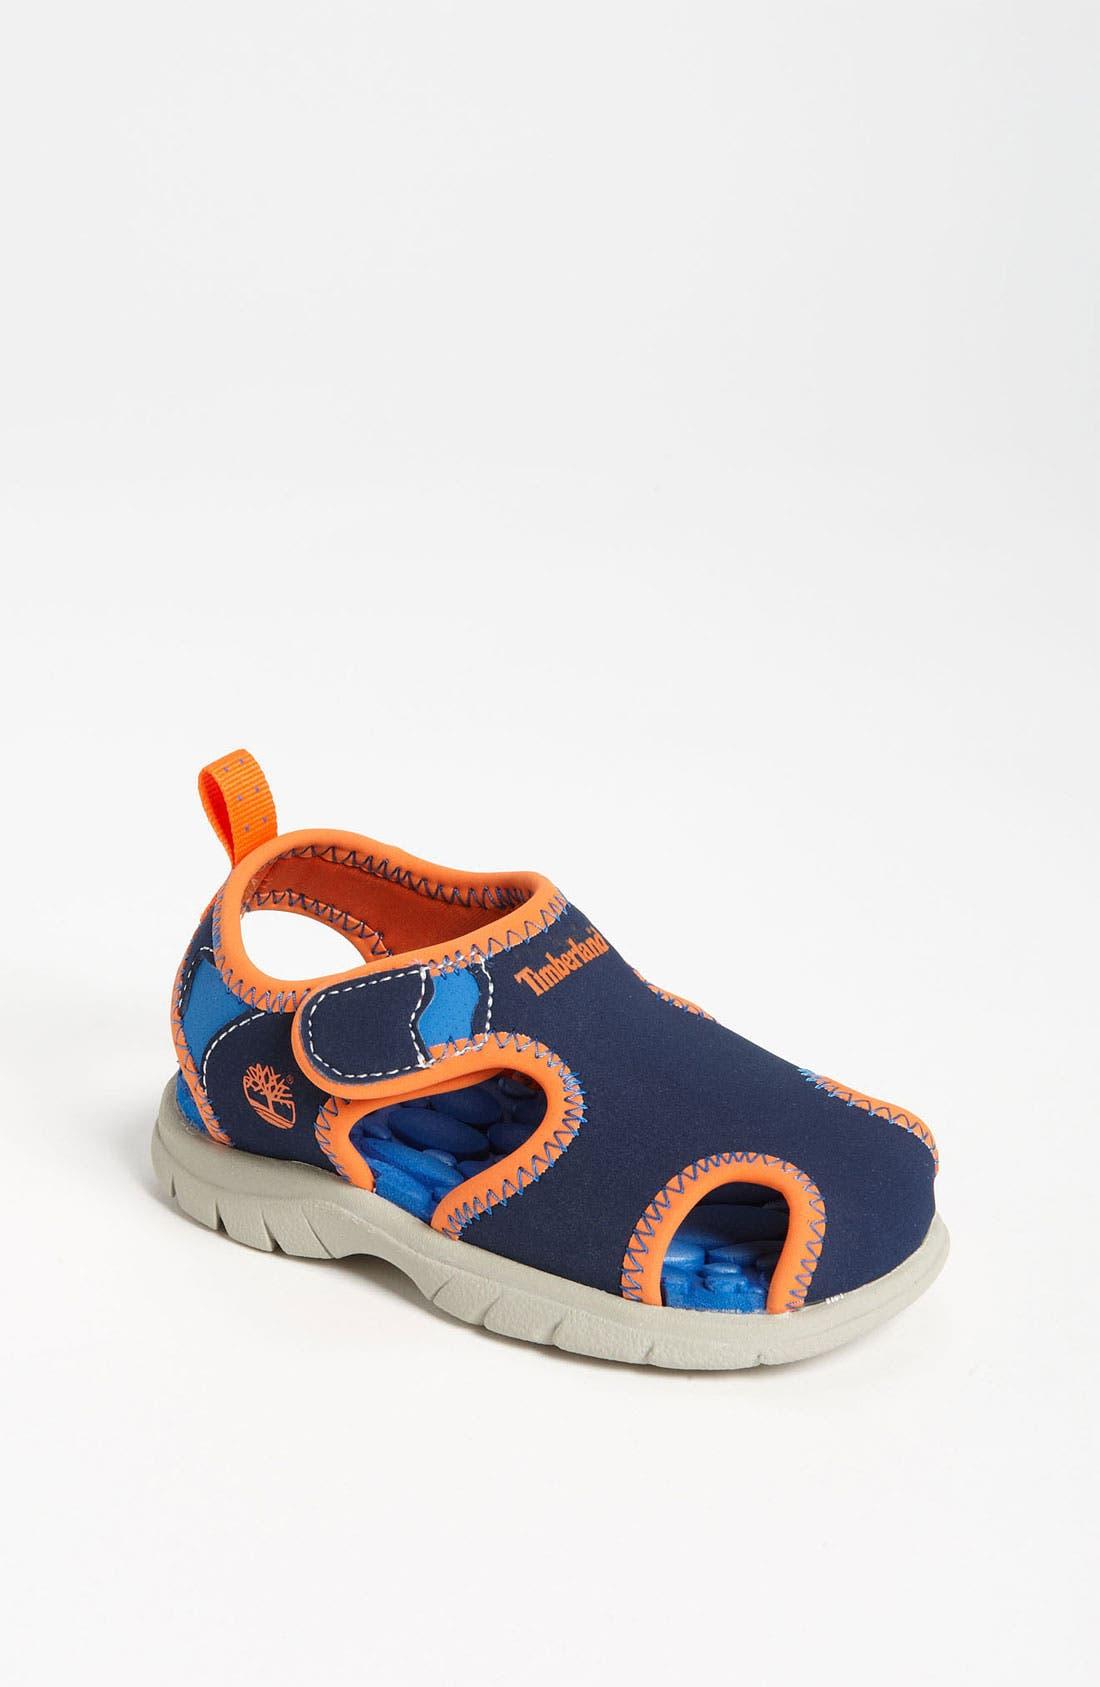 Alternate Image 1 Selected - Timberland 'Little Harbor' Sandal (Baby, Walker & Toddler)